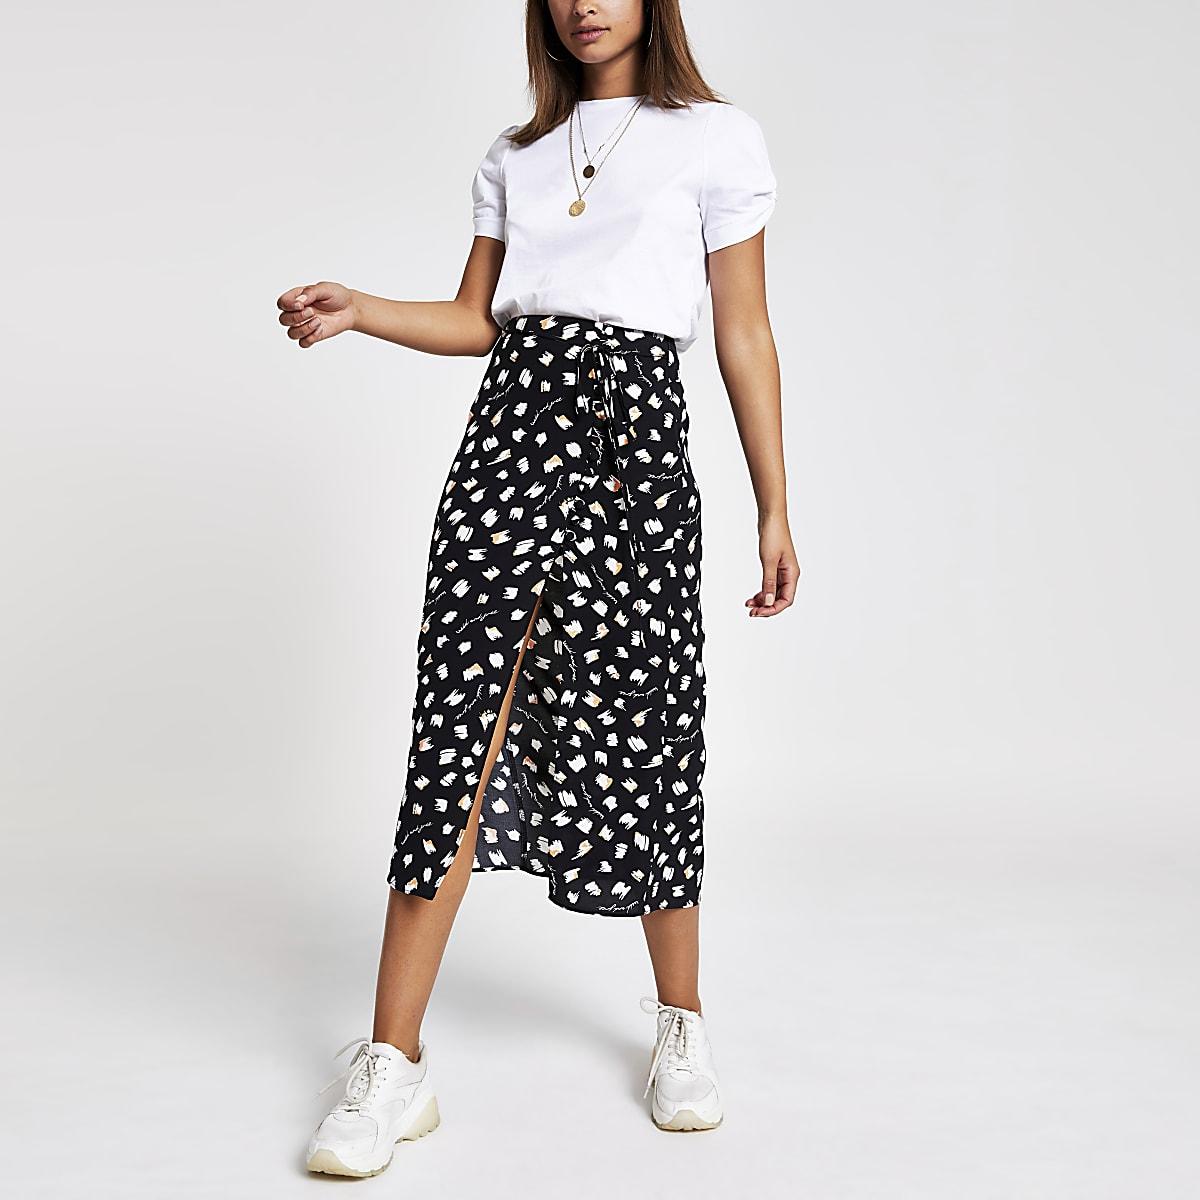 Caroline Flack black polka dot midi skirt